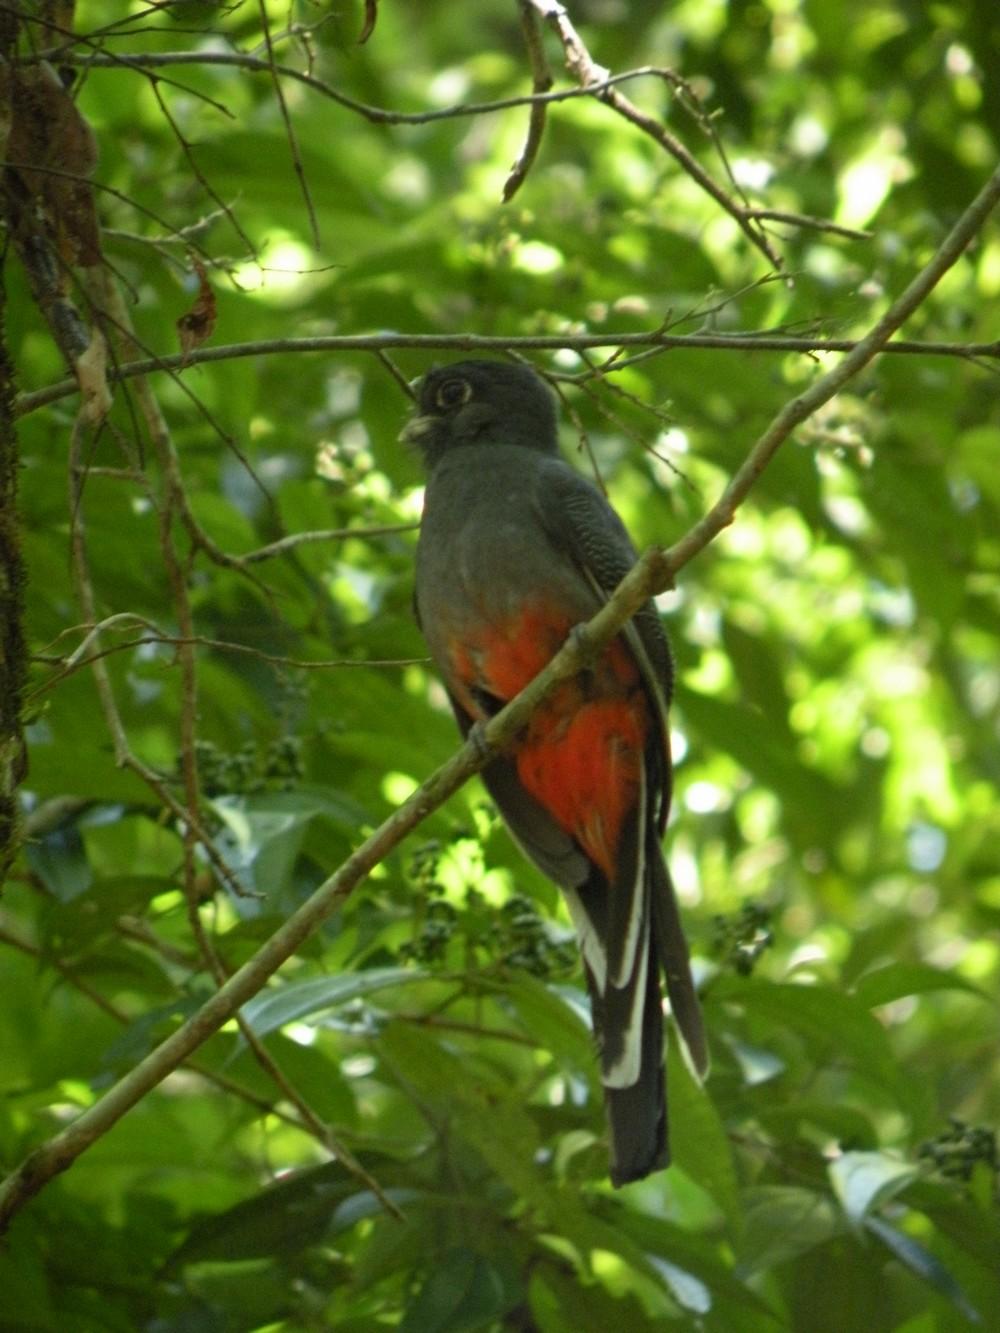 Oiseau - Parque Nacional Iguazú